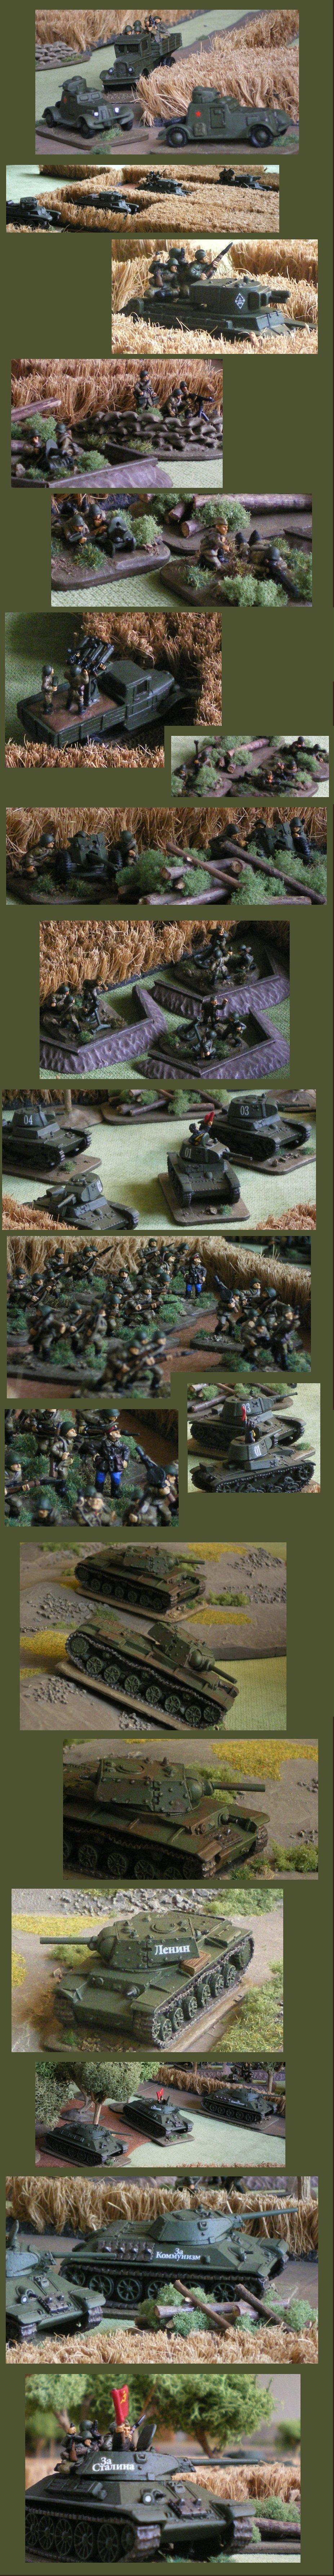 La Grande Guerre Patriotique, Acte I: le choc! (15mm) 160120010357454174